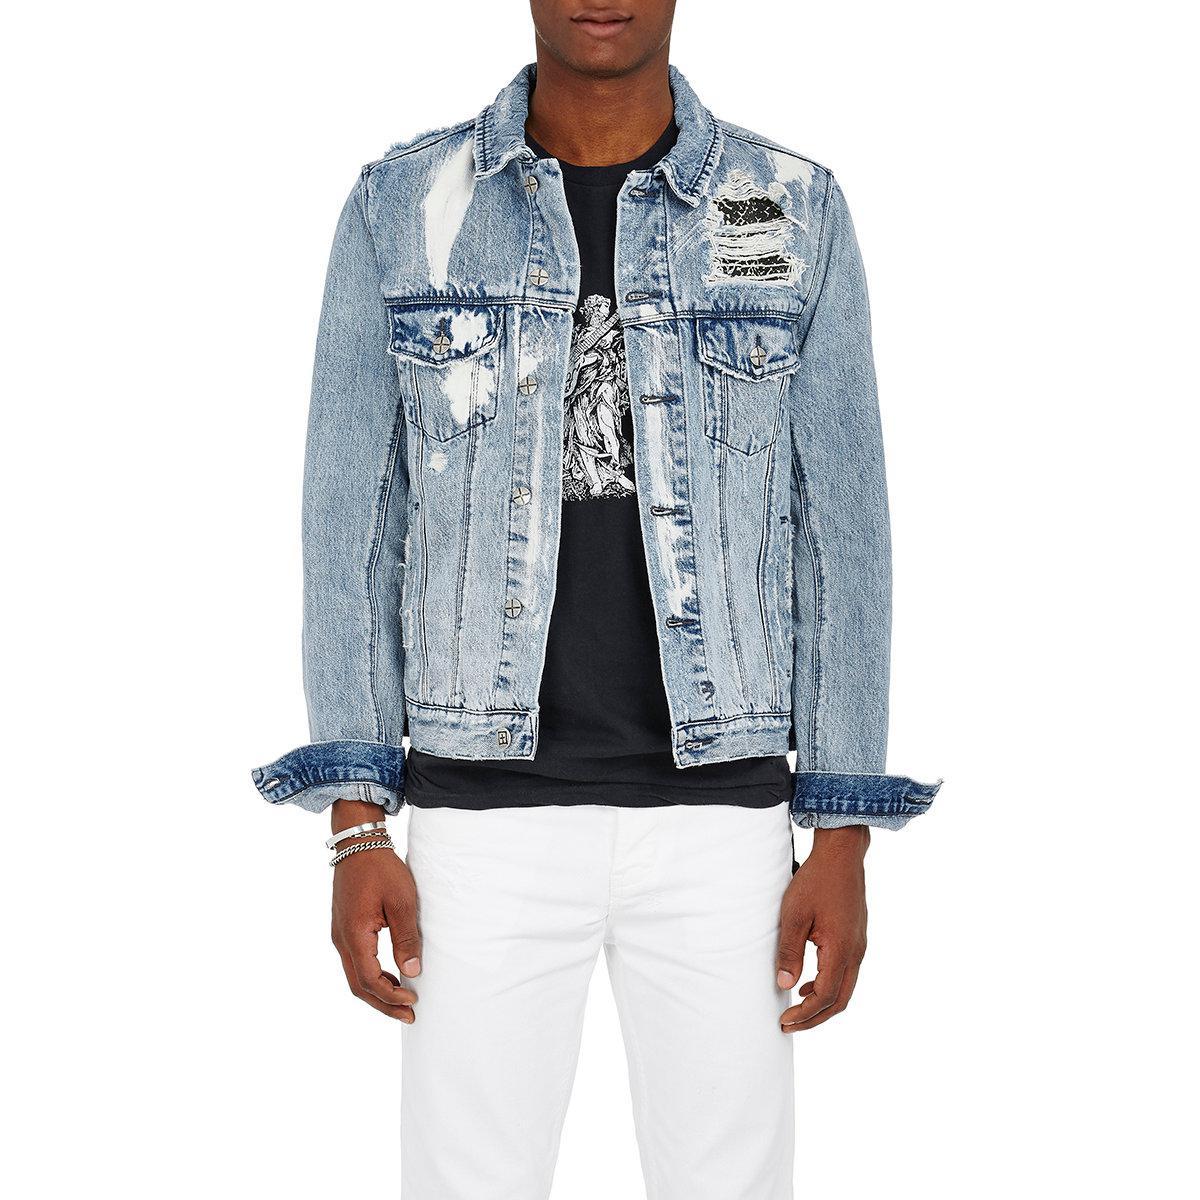 09230e1efa6d Lyst - Ksubi classic Distressed Cotton Denim Jacket in Blue for Men